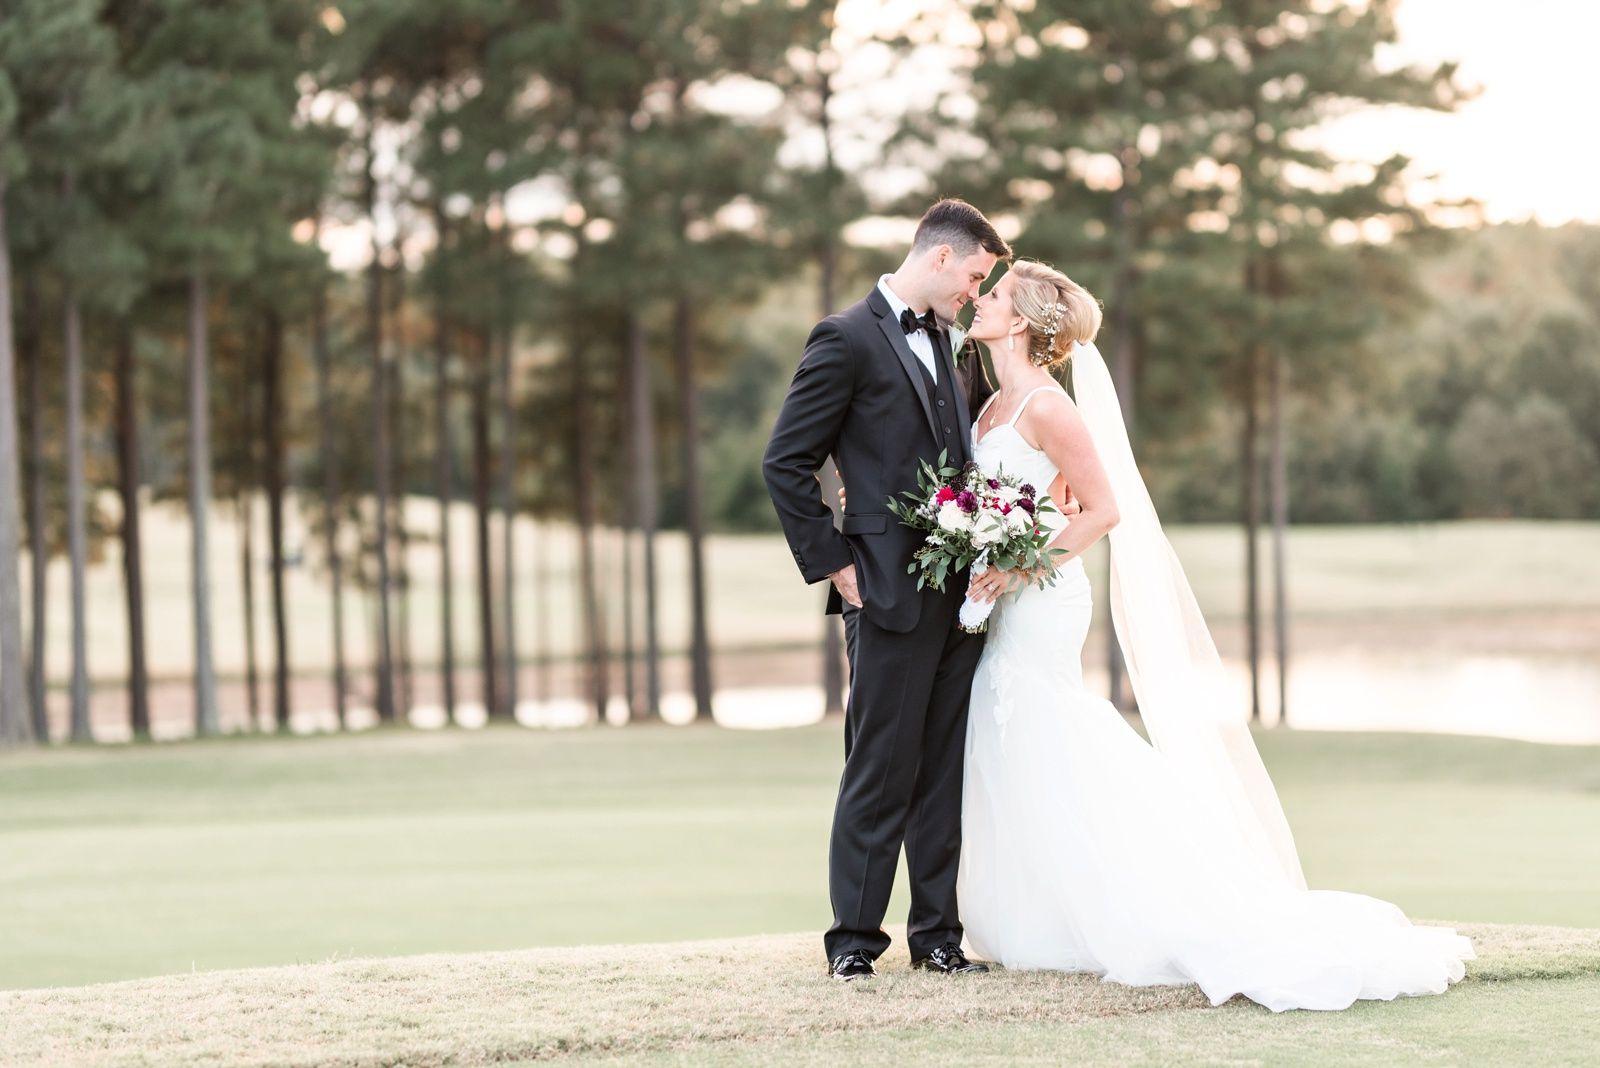 Wedding dresses richmond va  Independence Golf Club Richmond VA Wedding  Golf clubs and Weddings